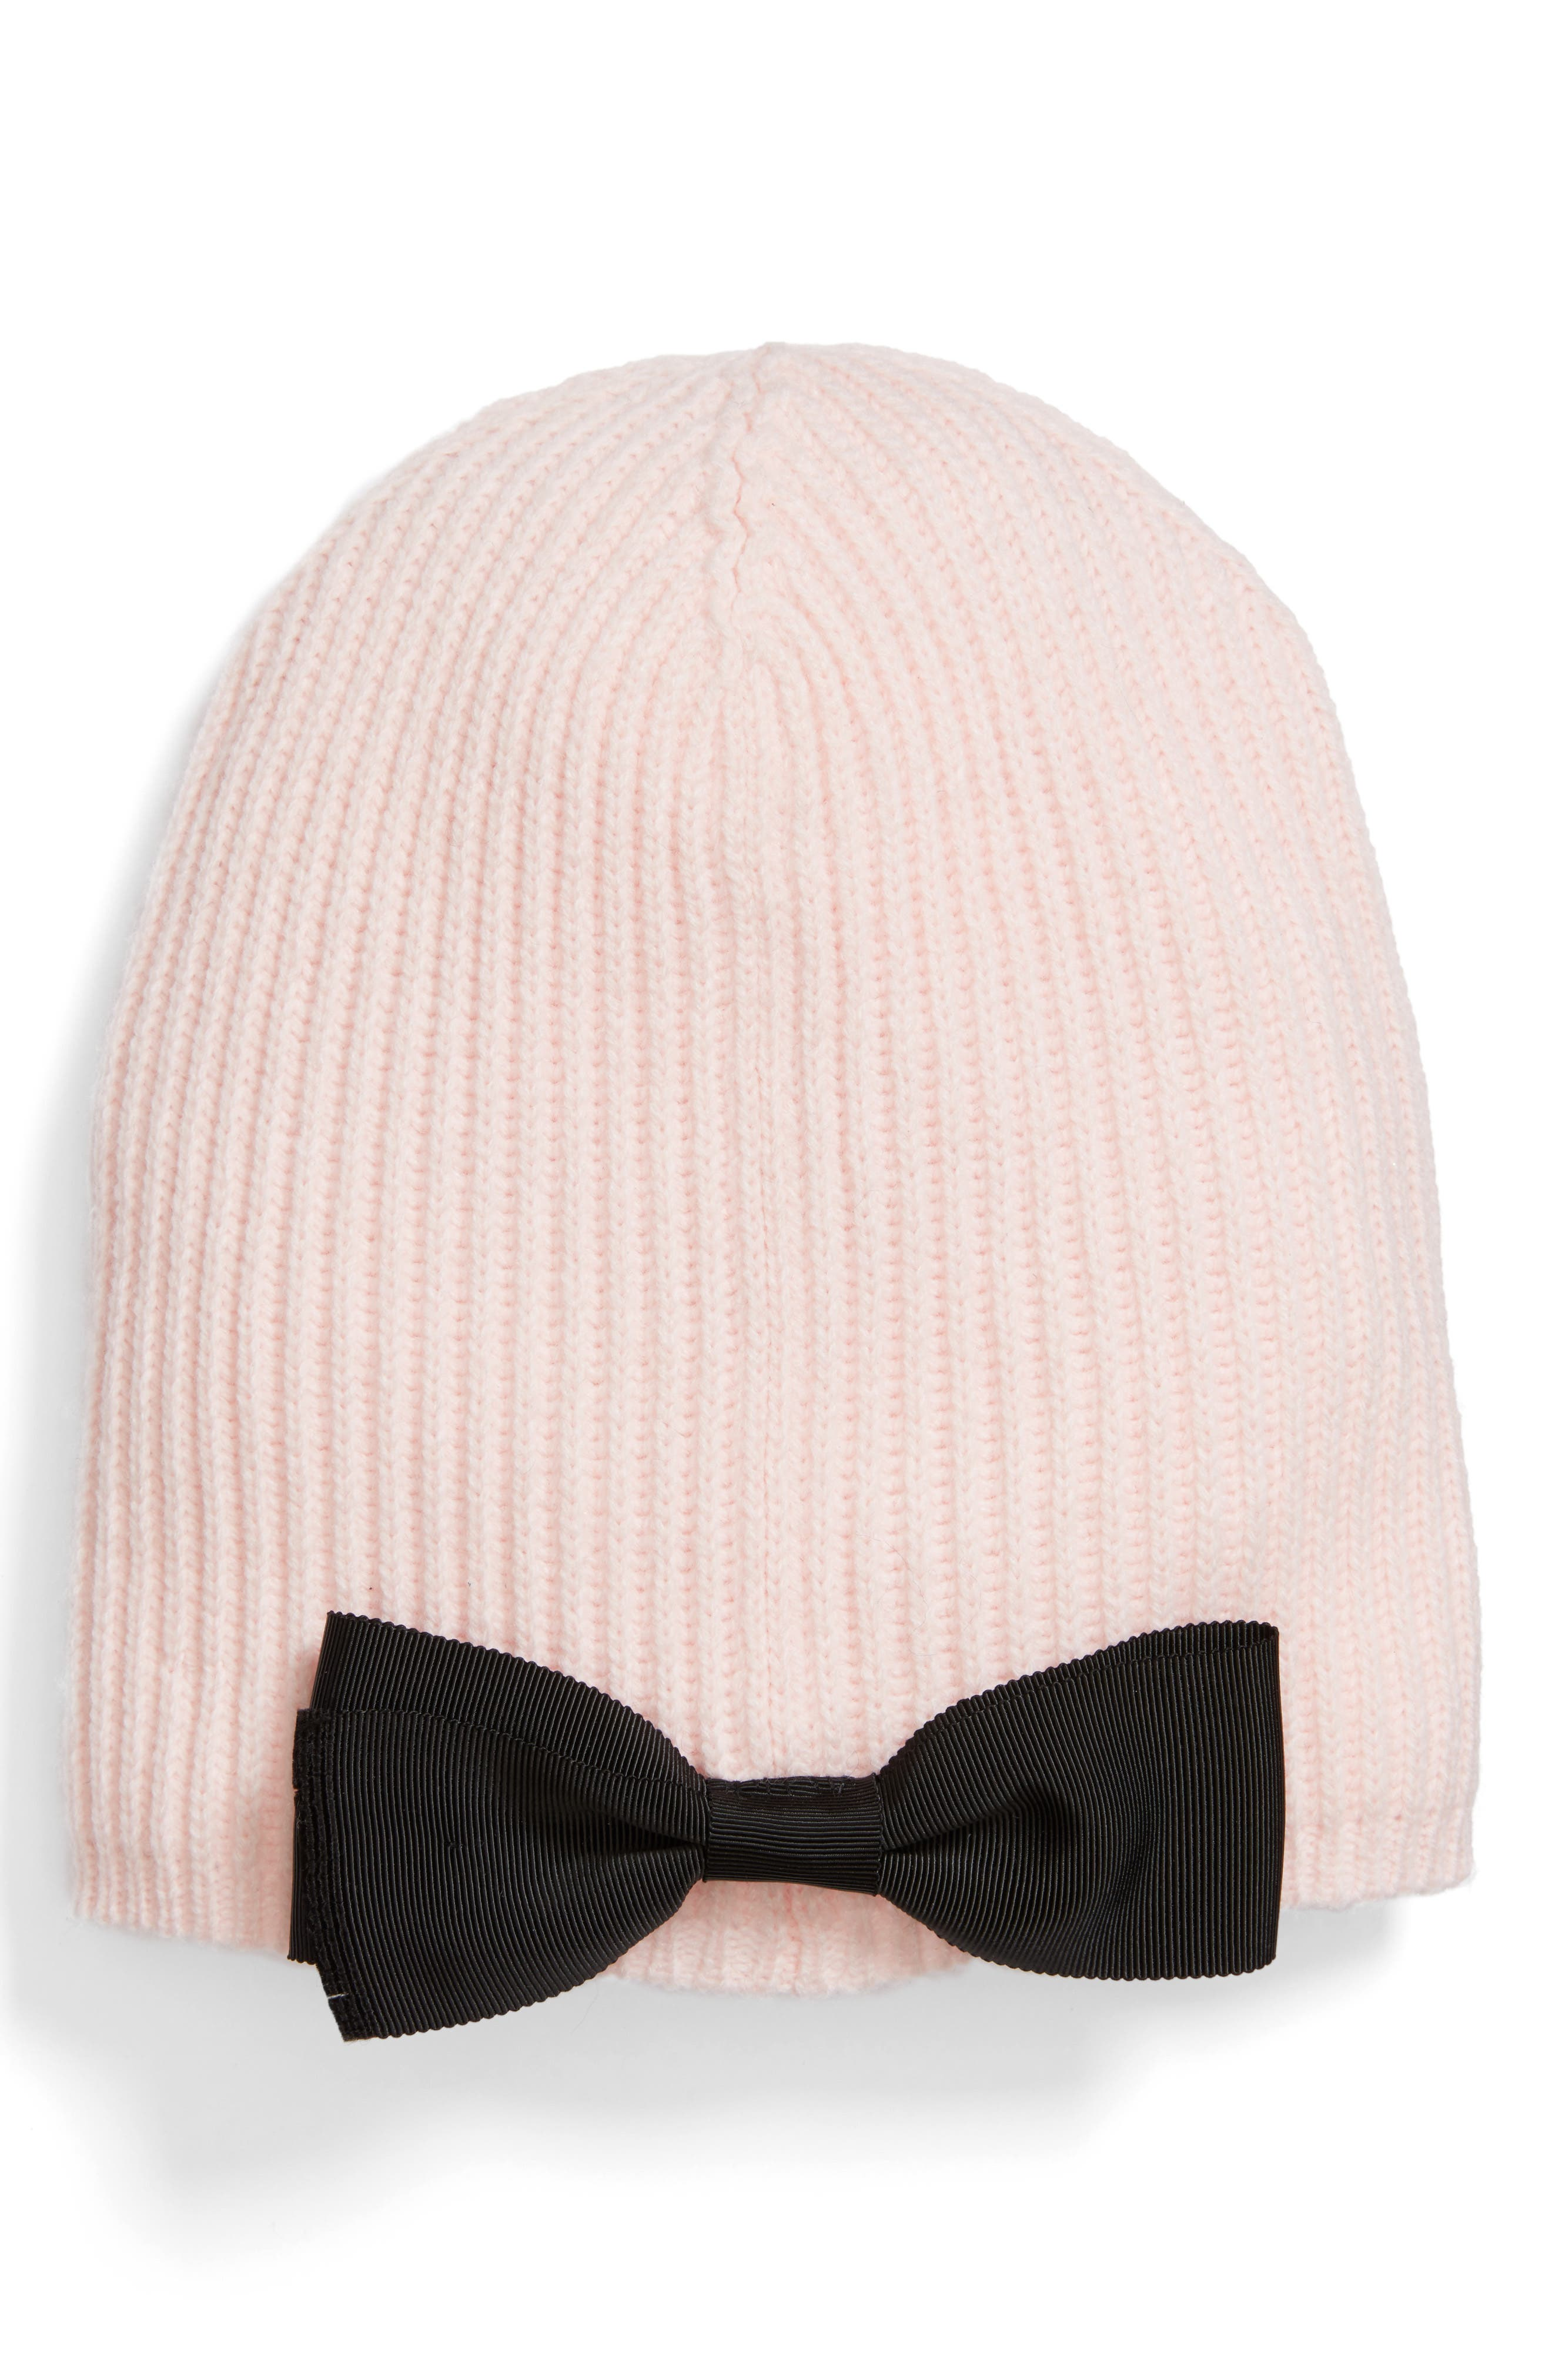 Main Image - kate spade new york grosgrain bow knit beanie